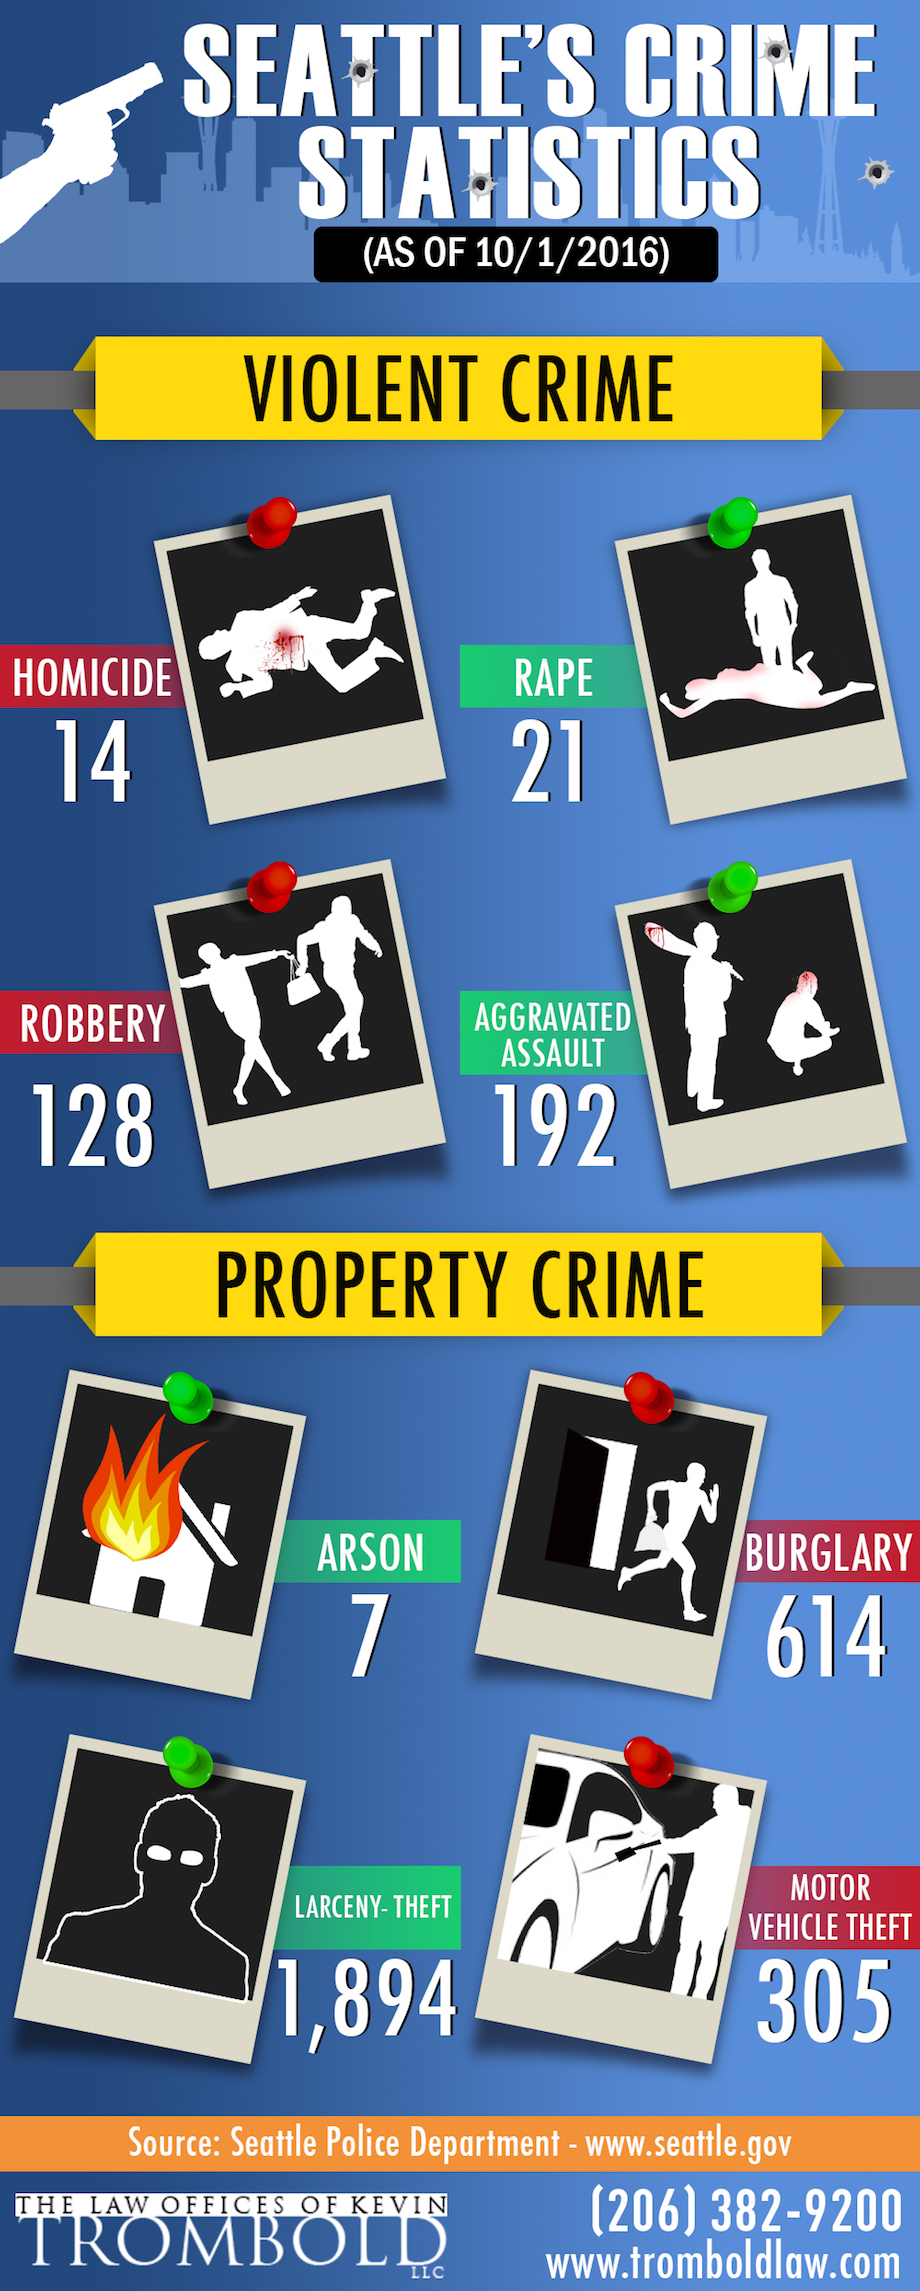 seattles-crime-statistics